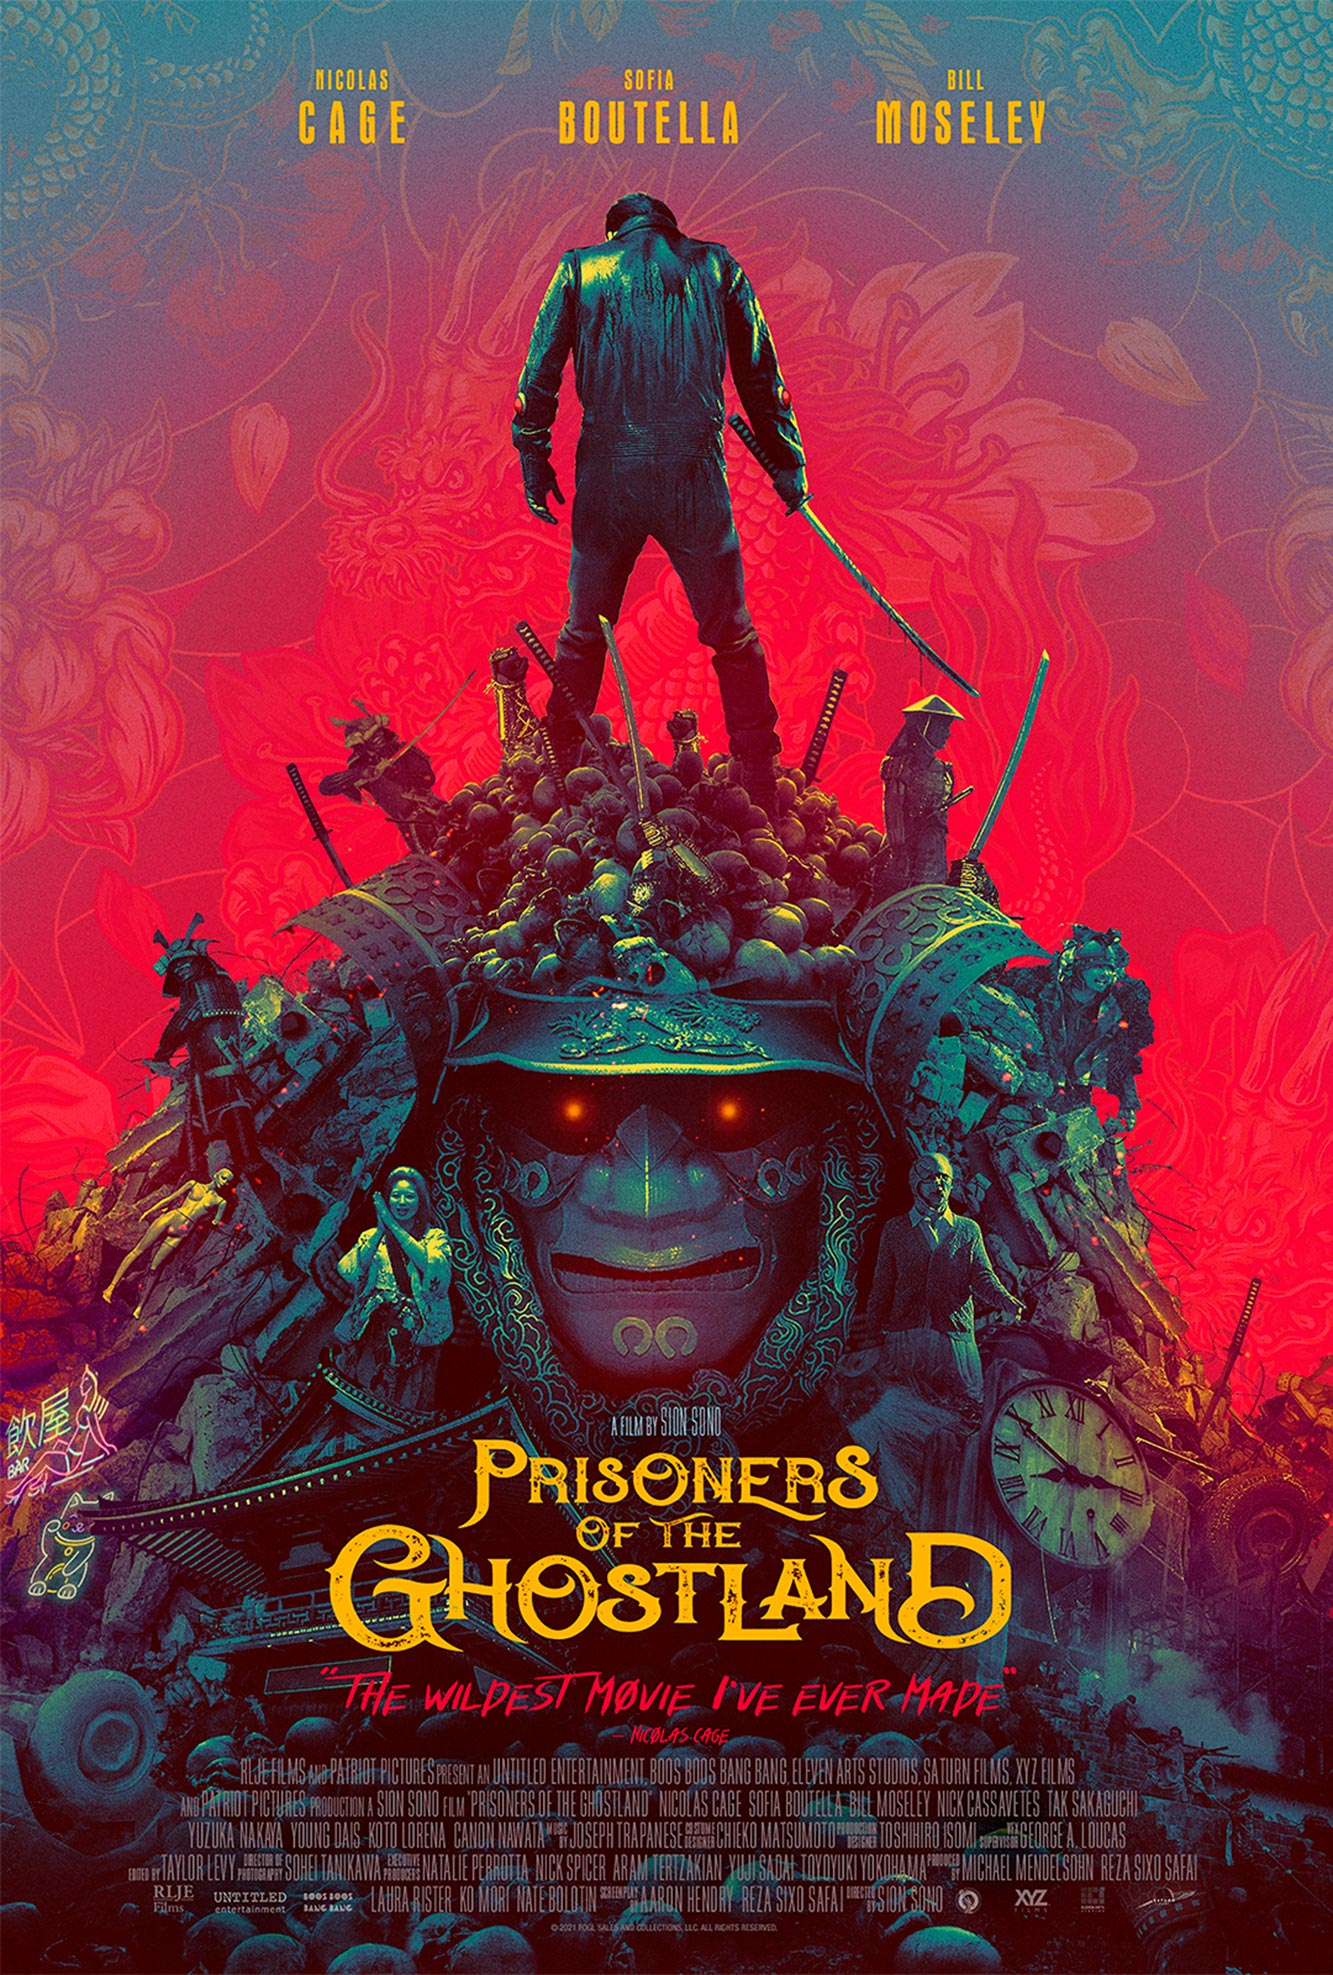 Prisoners of Ghostland